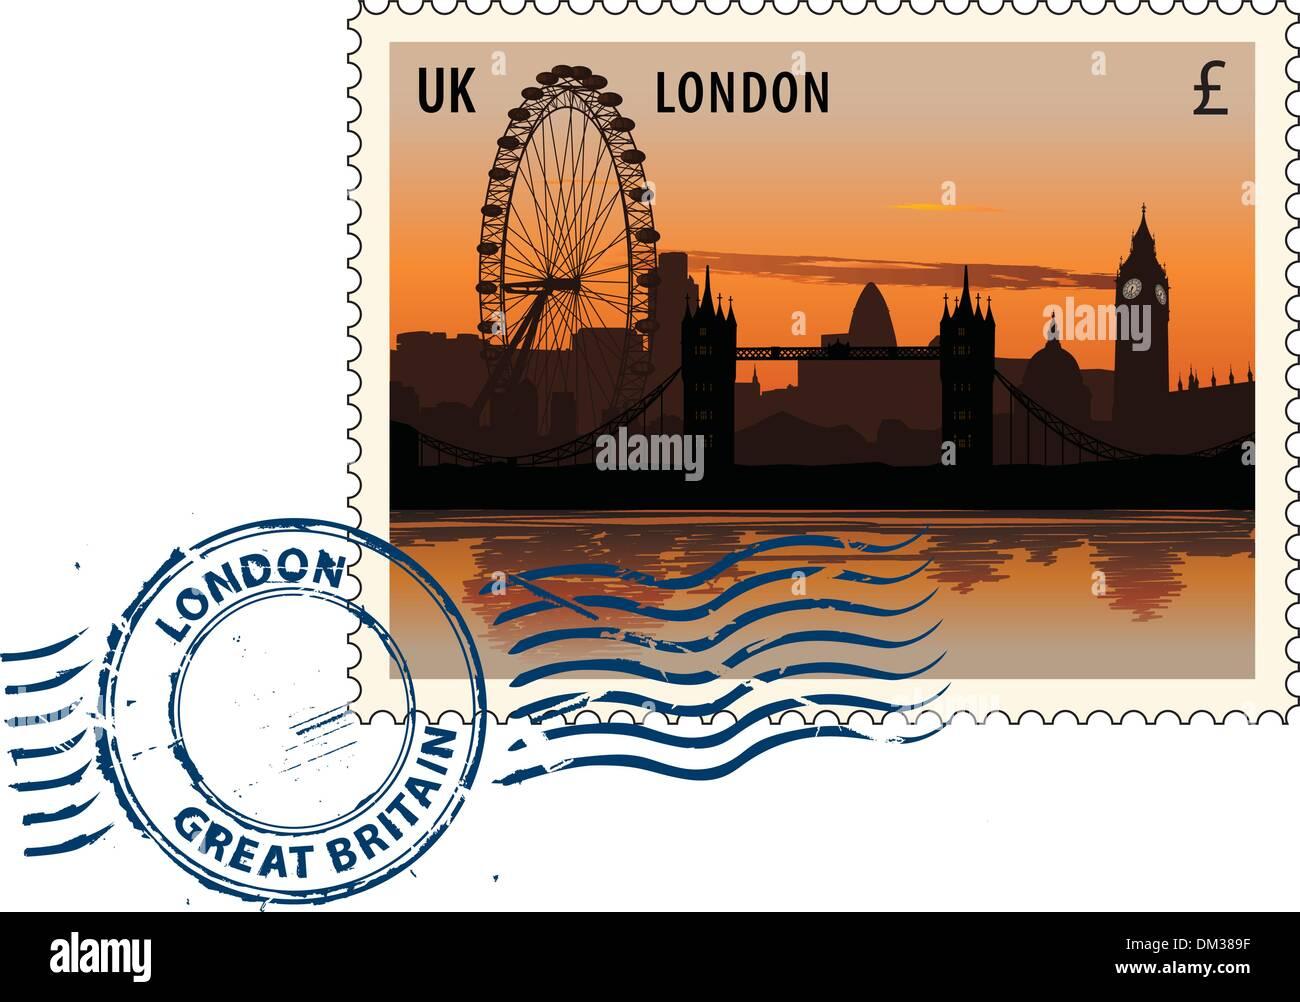 Postmark from London - Stock Image